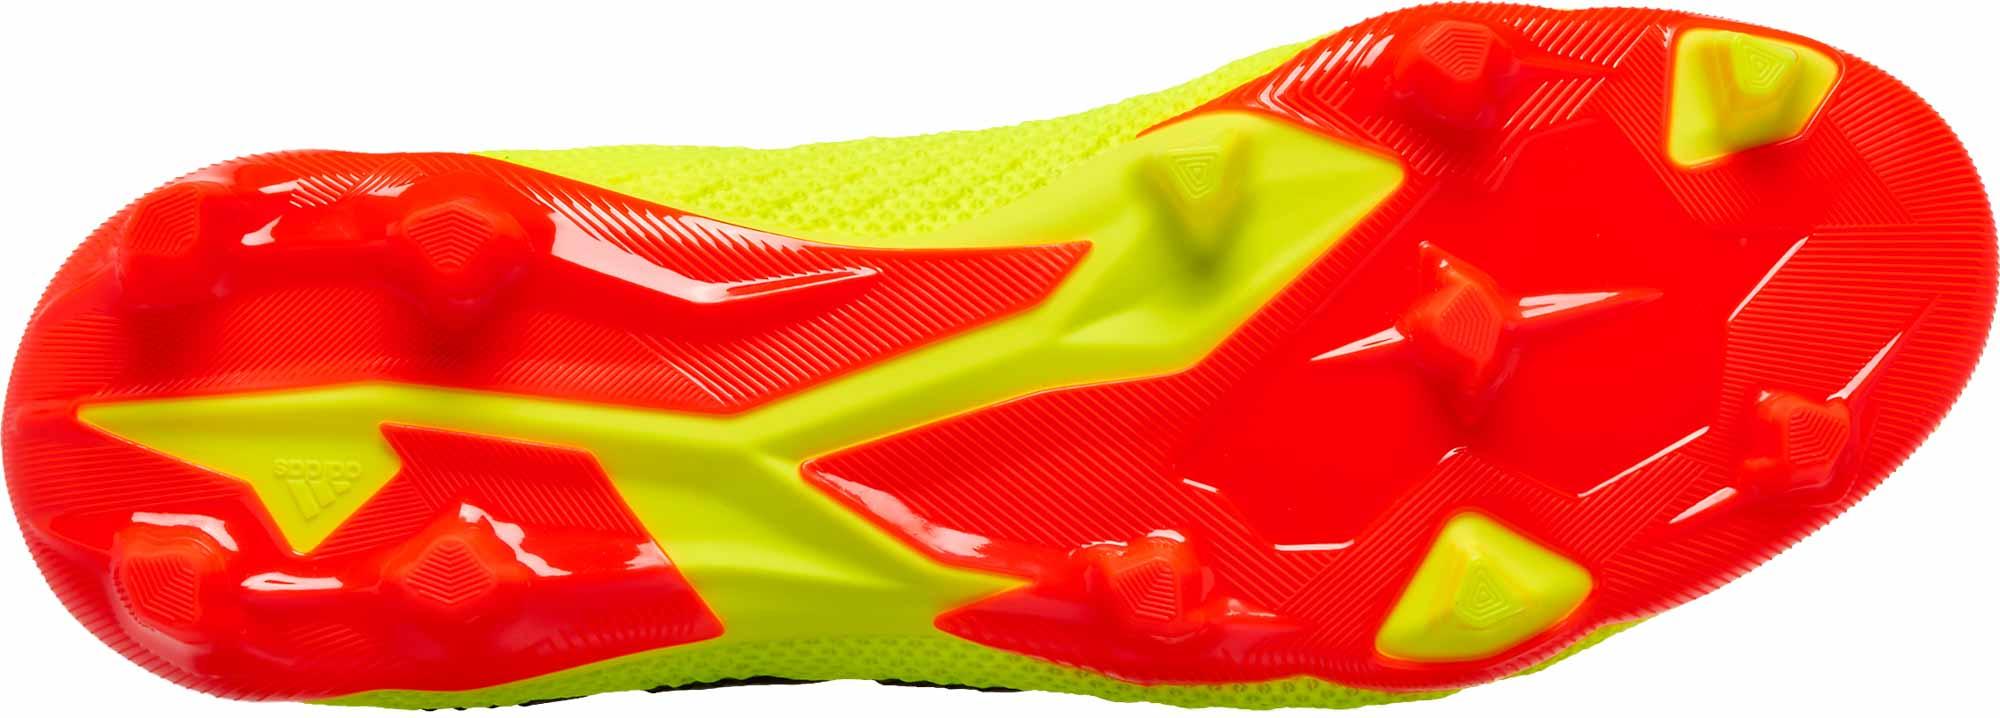 Kids adidas Predator 18.1 FG – Energy Mode   Fußball   Fussball